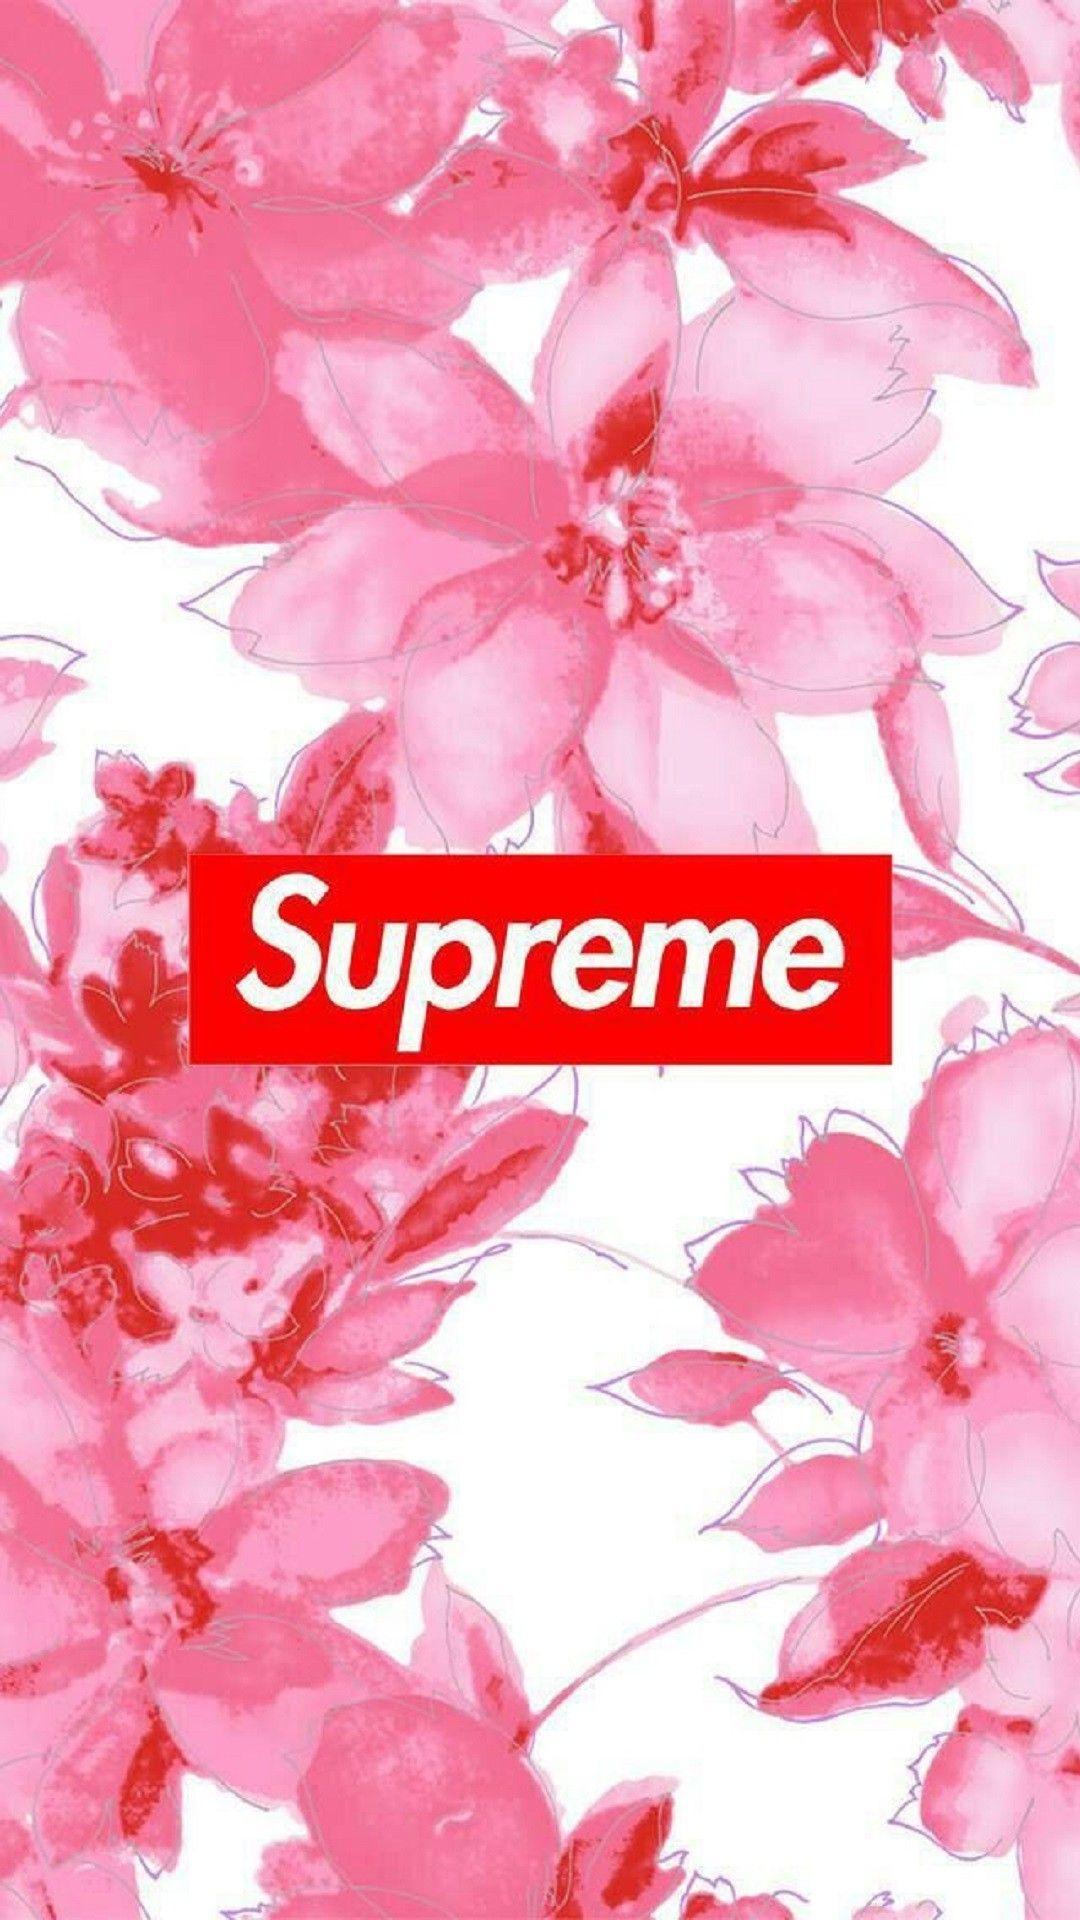 Supreme iPhone 5 wallpaper